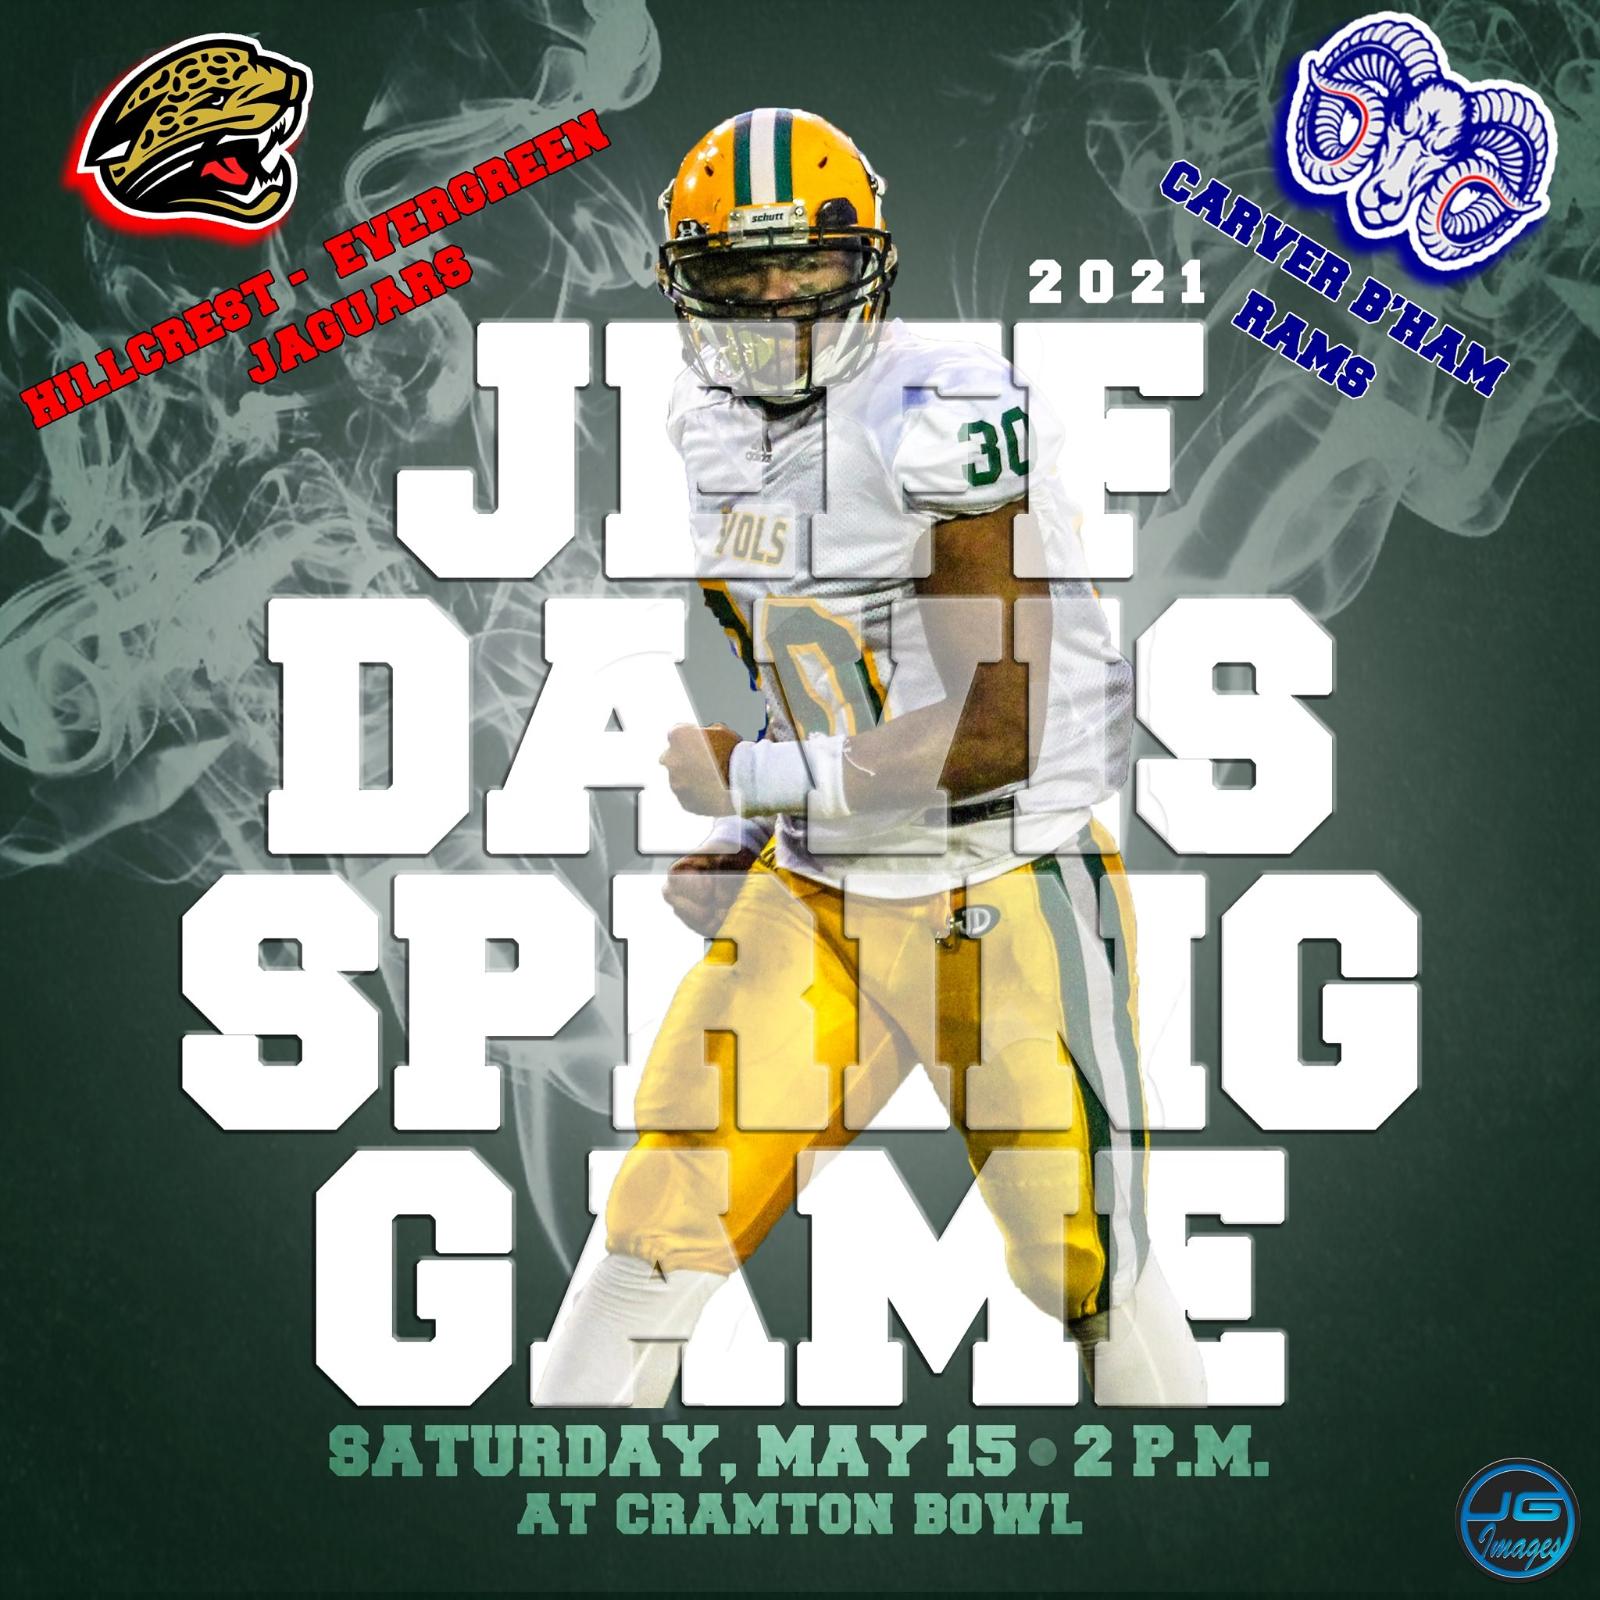 2021 Jeff Davis Football Spring Game vs. Hillcrest Evergreen/Carver-Birmingham